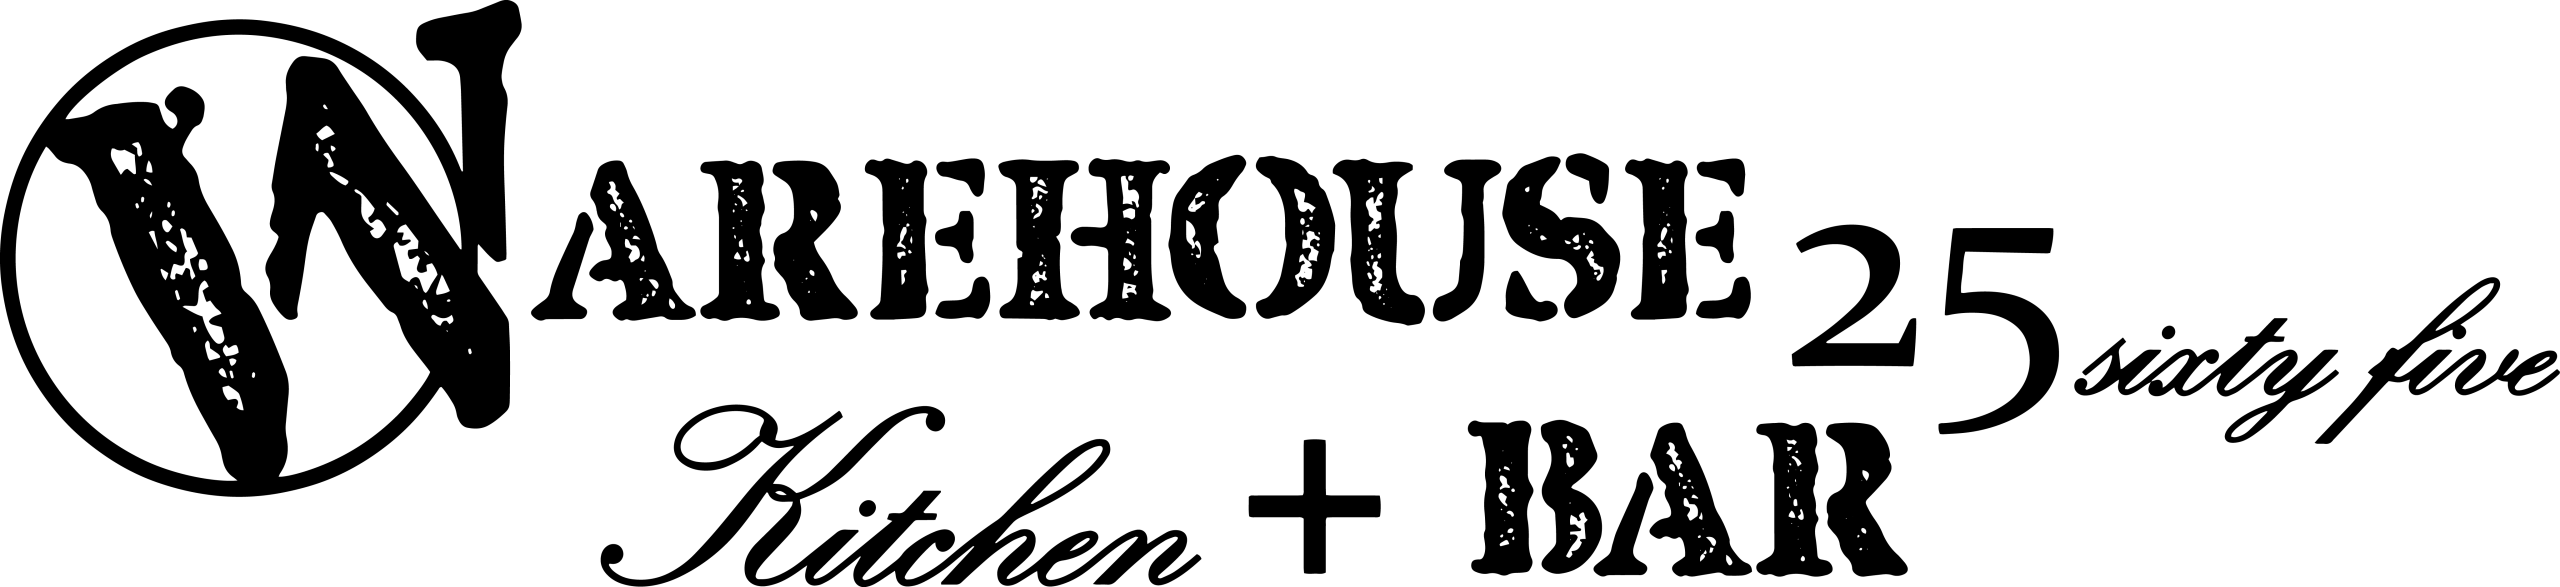 wordmark-black